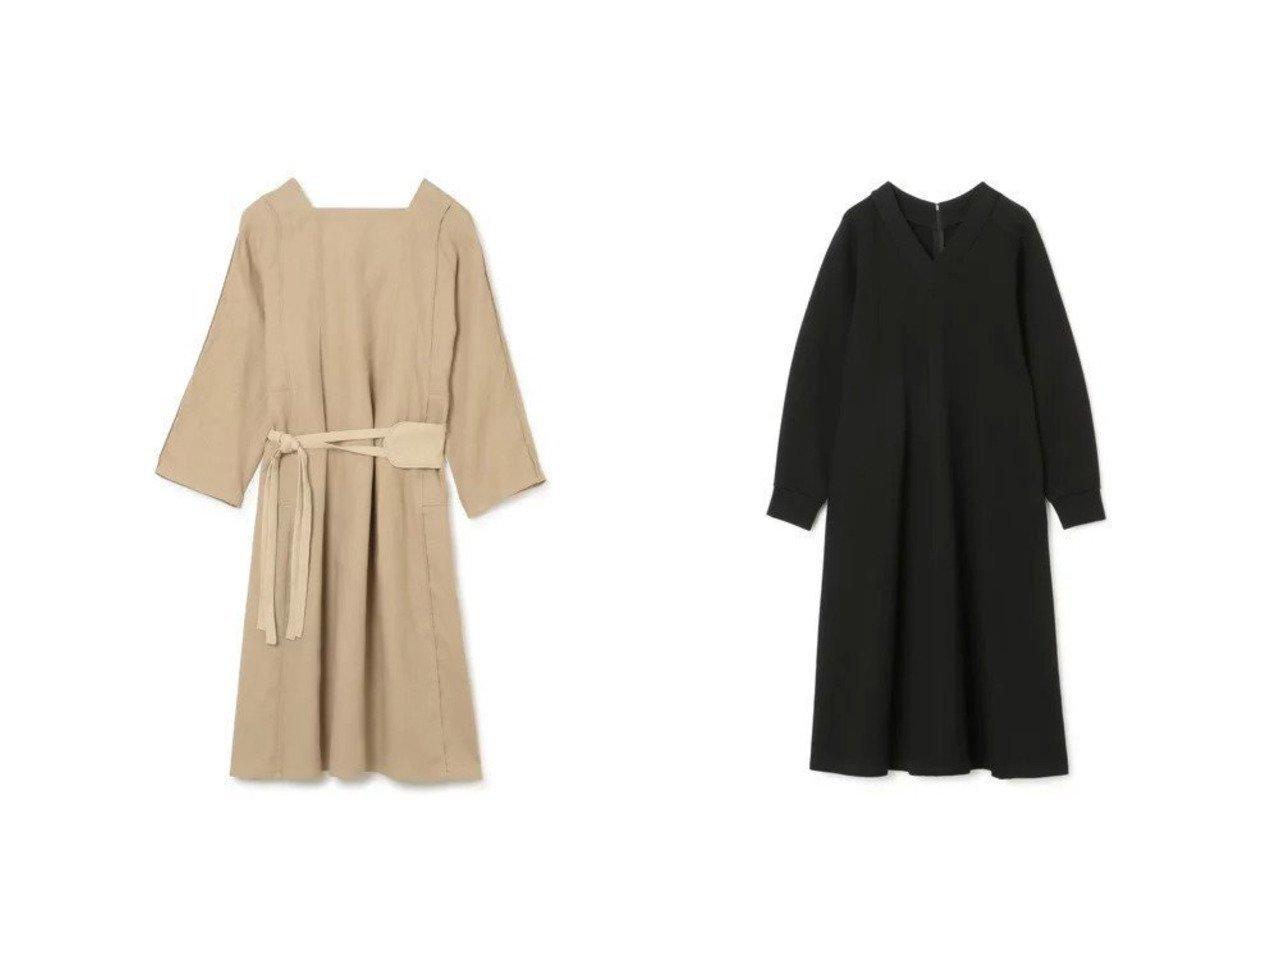 【LE CIEL BLEU/ルシェル ブルー】のVNeckSweatDress&【QUWAGI/クワギ】のHEMP DRESS 【ワンピース・ドレス】おすすめ!人気、トレンド・レディースファッションの通販 おすすめで人気の流行・トレンド、ファッションの通販商品 メンズファッション・キッズファッション・インテリア・家具・レディースファッション・服の通販 founy(ファニー) https://founy.com/ ファッション Fashion レディースファッション WOMEN ワンピース Dress ドレス Party Dresses シャツワンピース Shirt Dresses スウェット ドレス フレア ルーズ 洗える 長袖 |ID:crp329100000031147